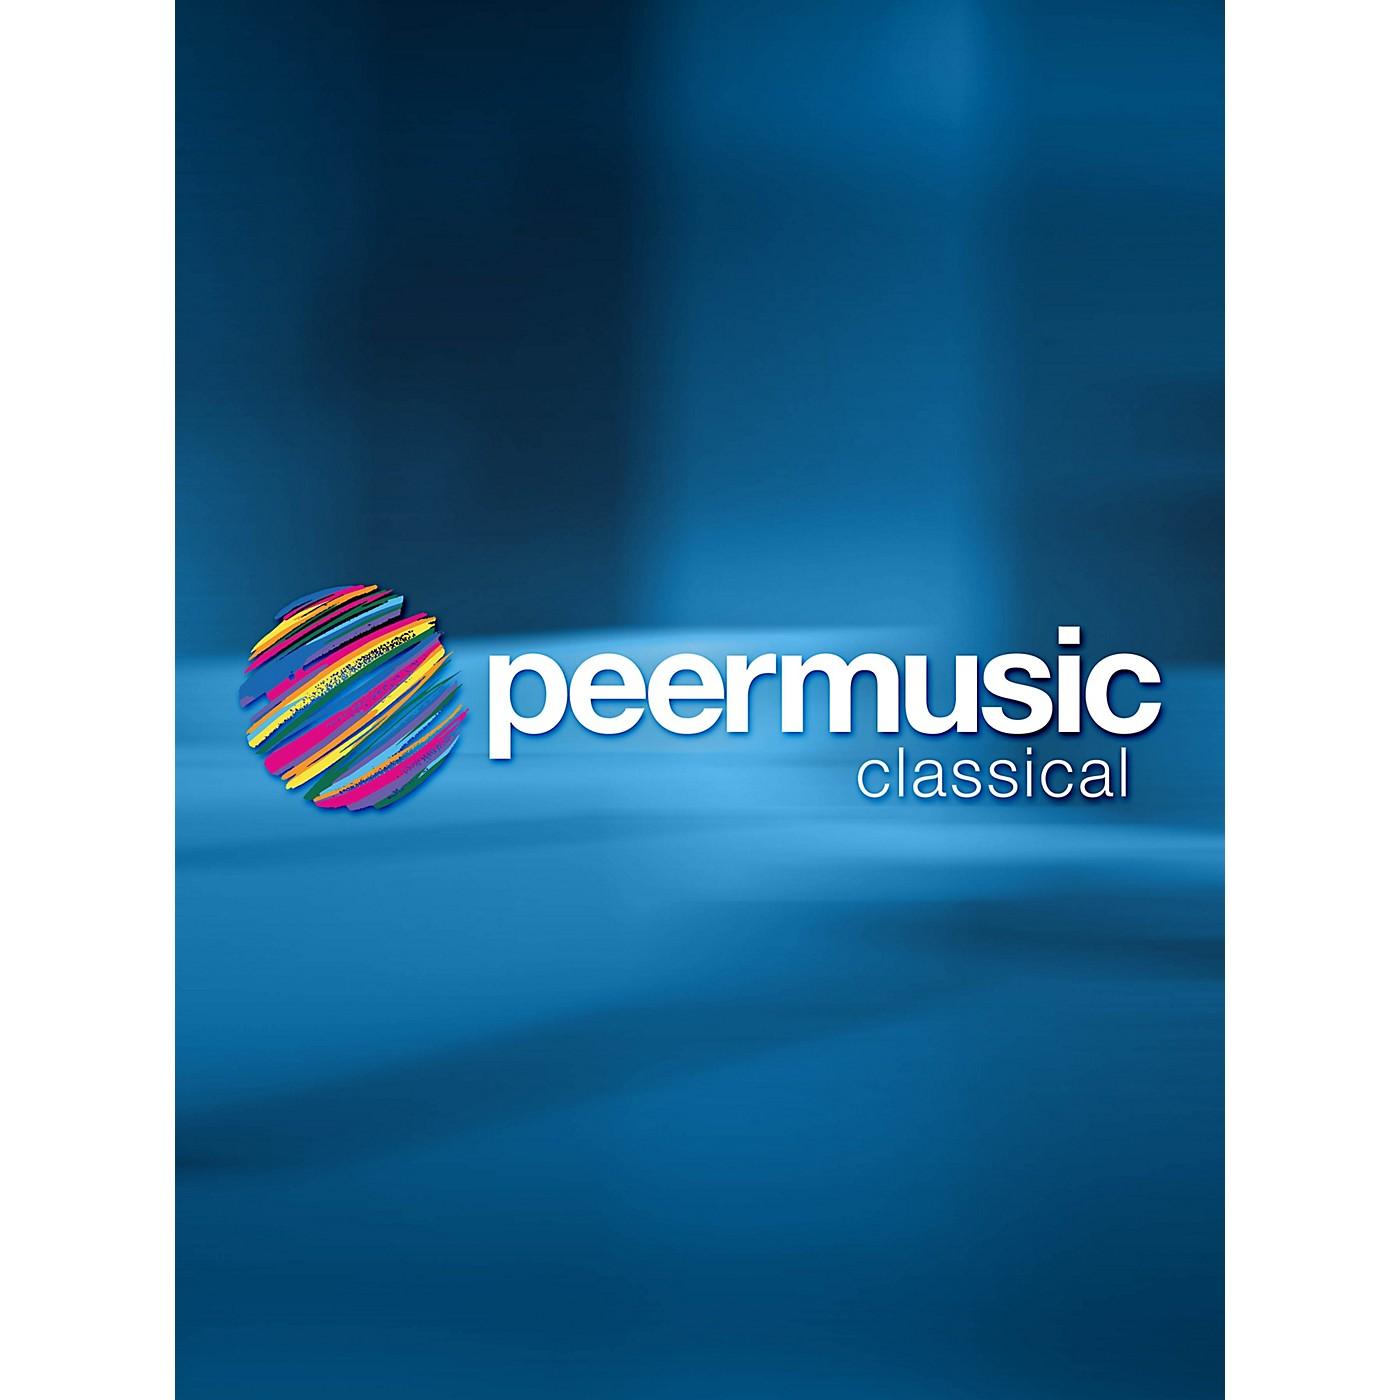 Peer Music 3 Sonatas Originally Composed for Viola da Gamba (Cello and Piano) Peermusic Classical Series Softcover thumbnail